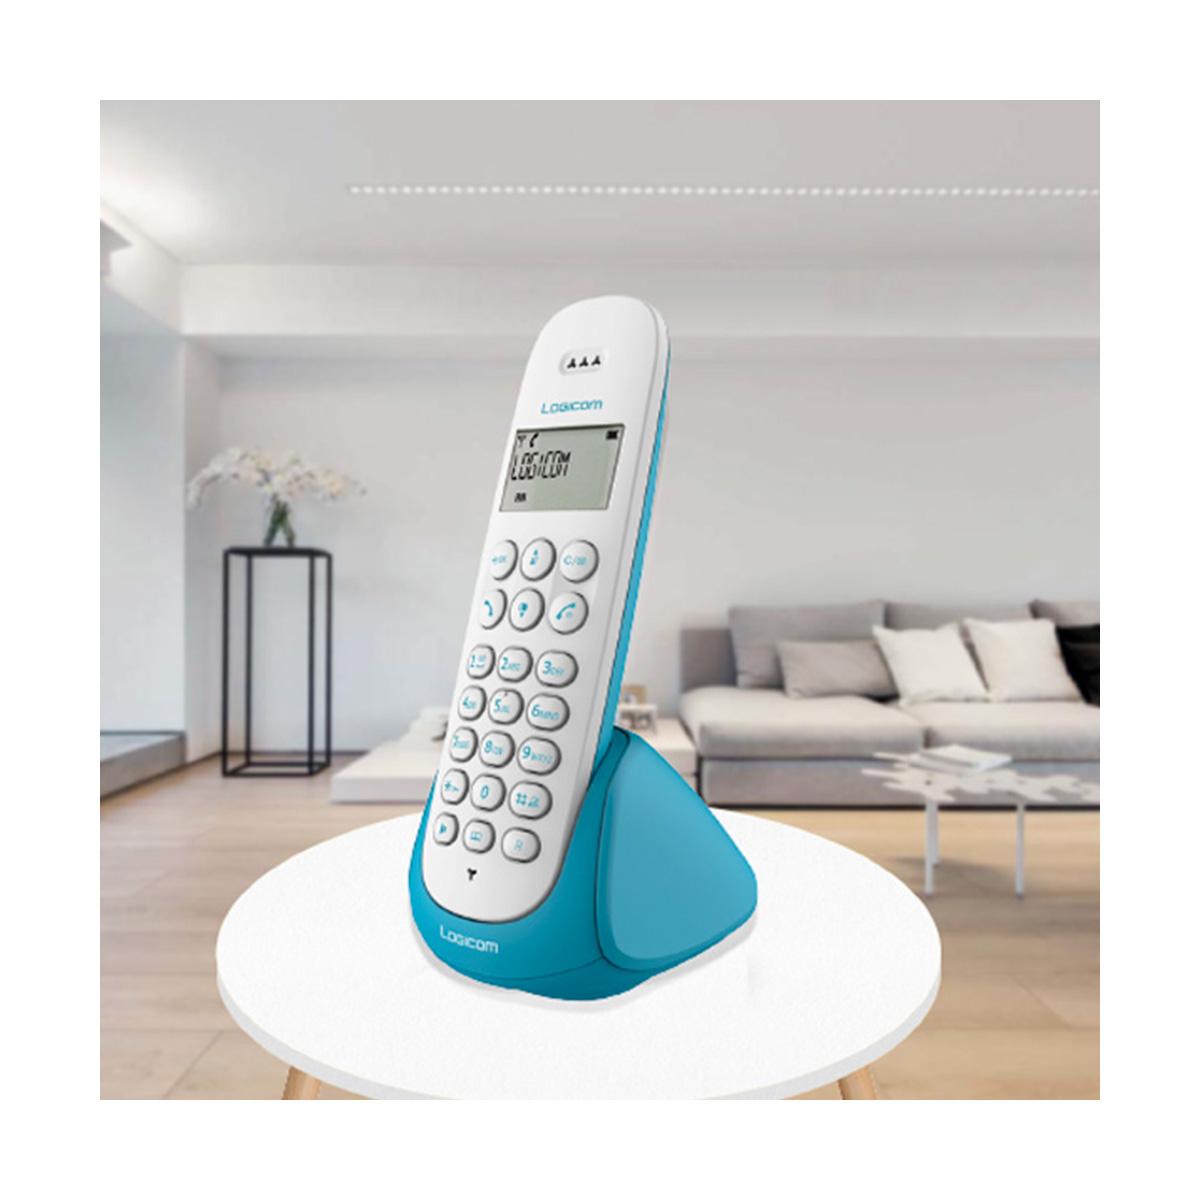 t l phonie t l phone r sidentielle aura produits t l phonie tendance logicom. Black Bedroom Furniture Sets. Home Design Ideas